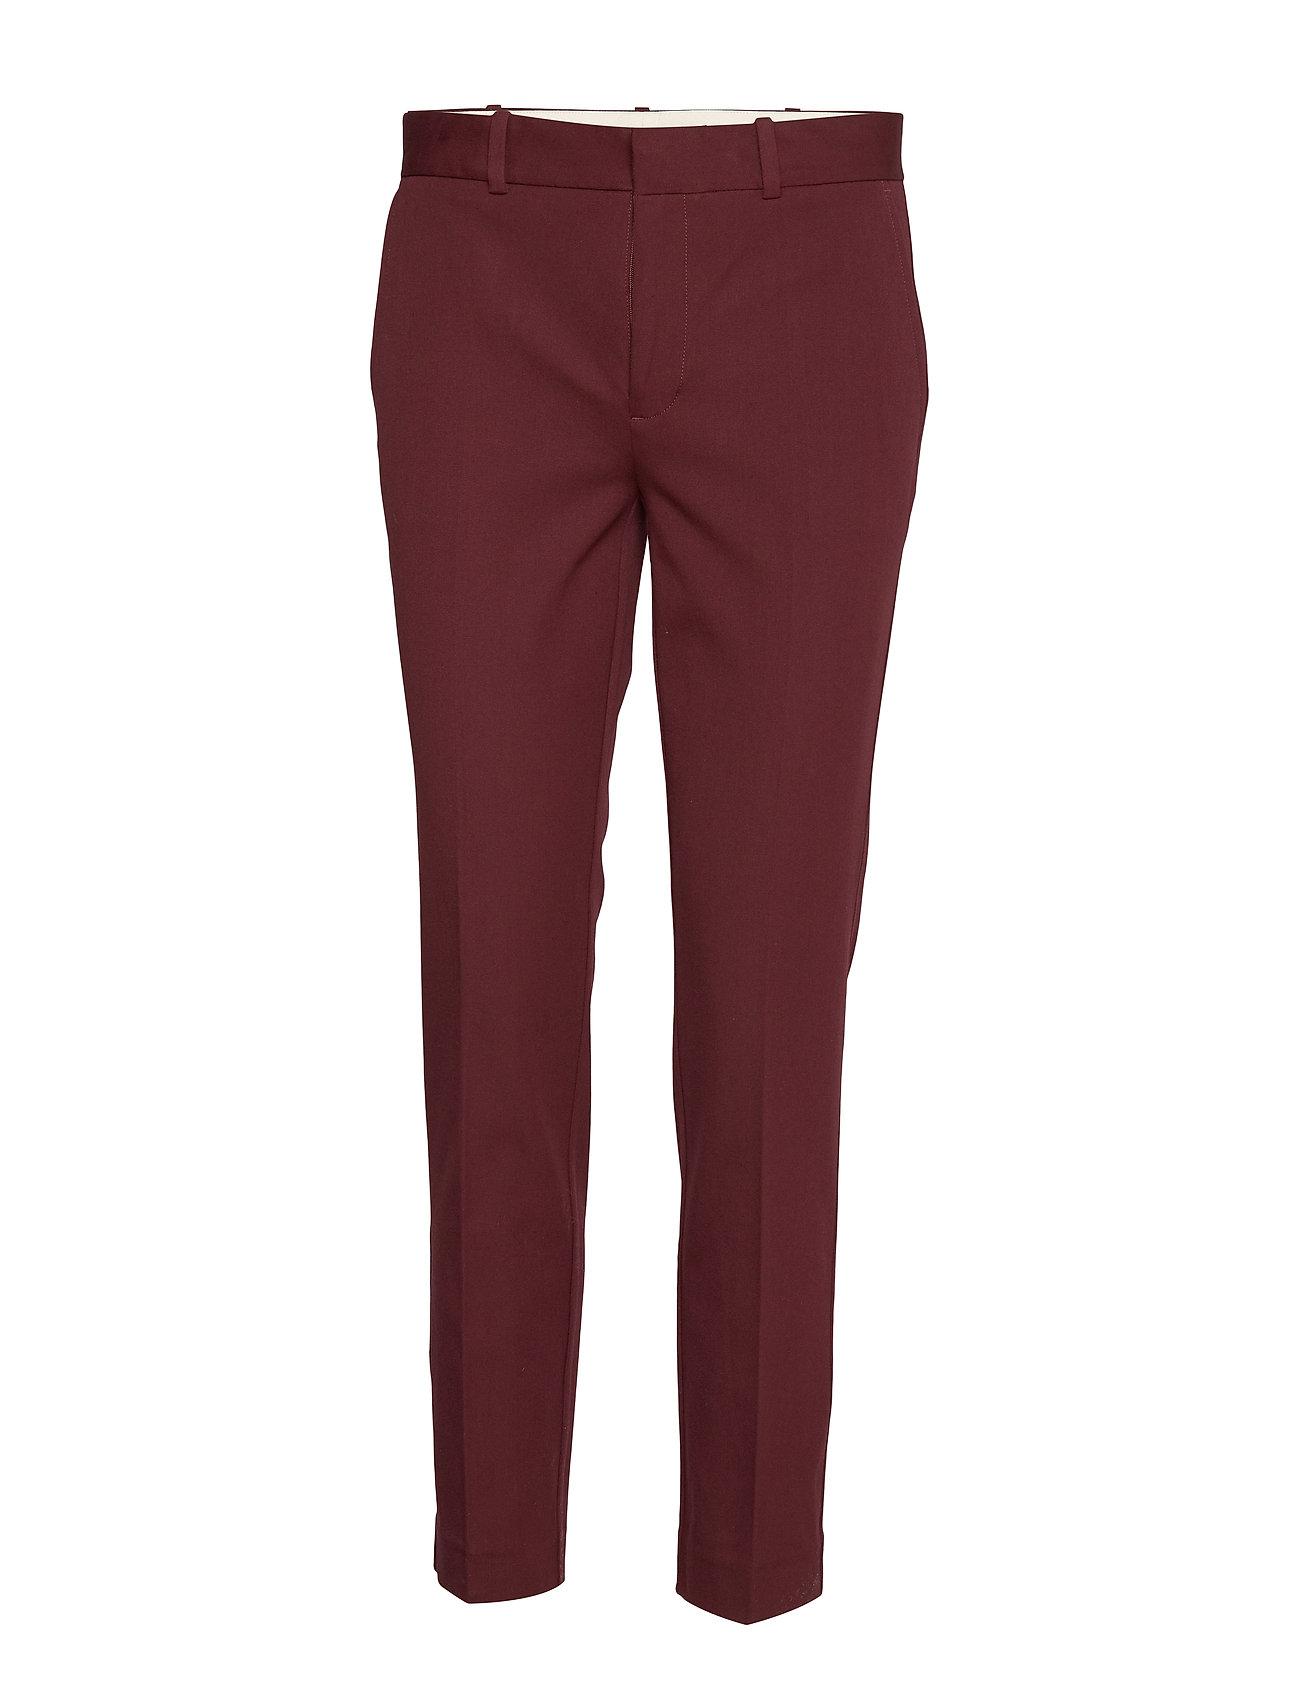 Polo Ralph Lauren Bi-Stretch Twill Pant - RUBY RED